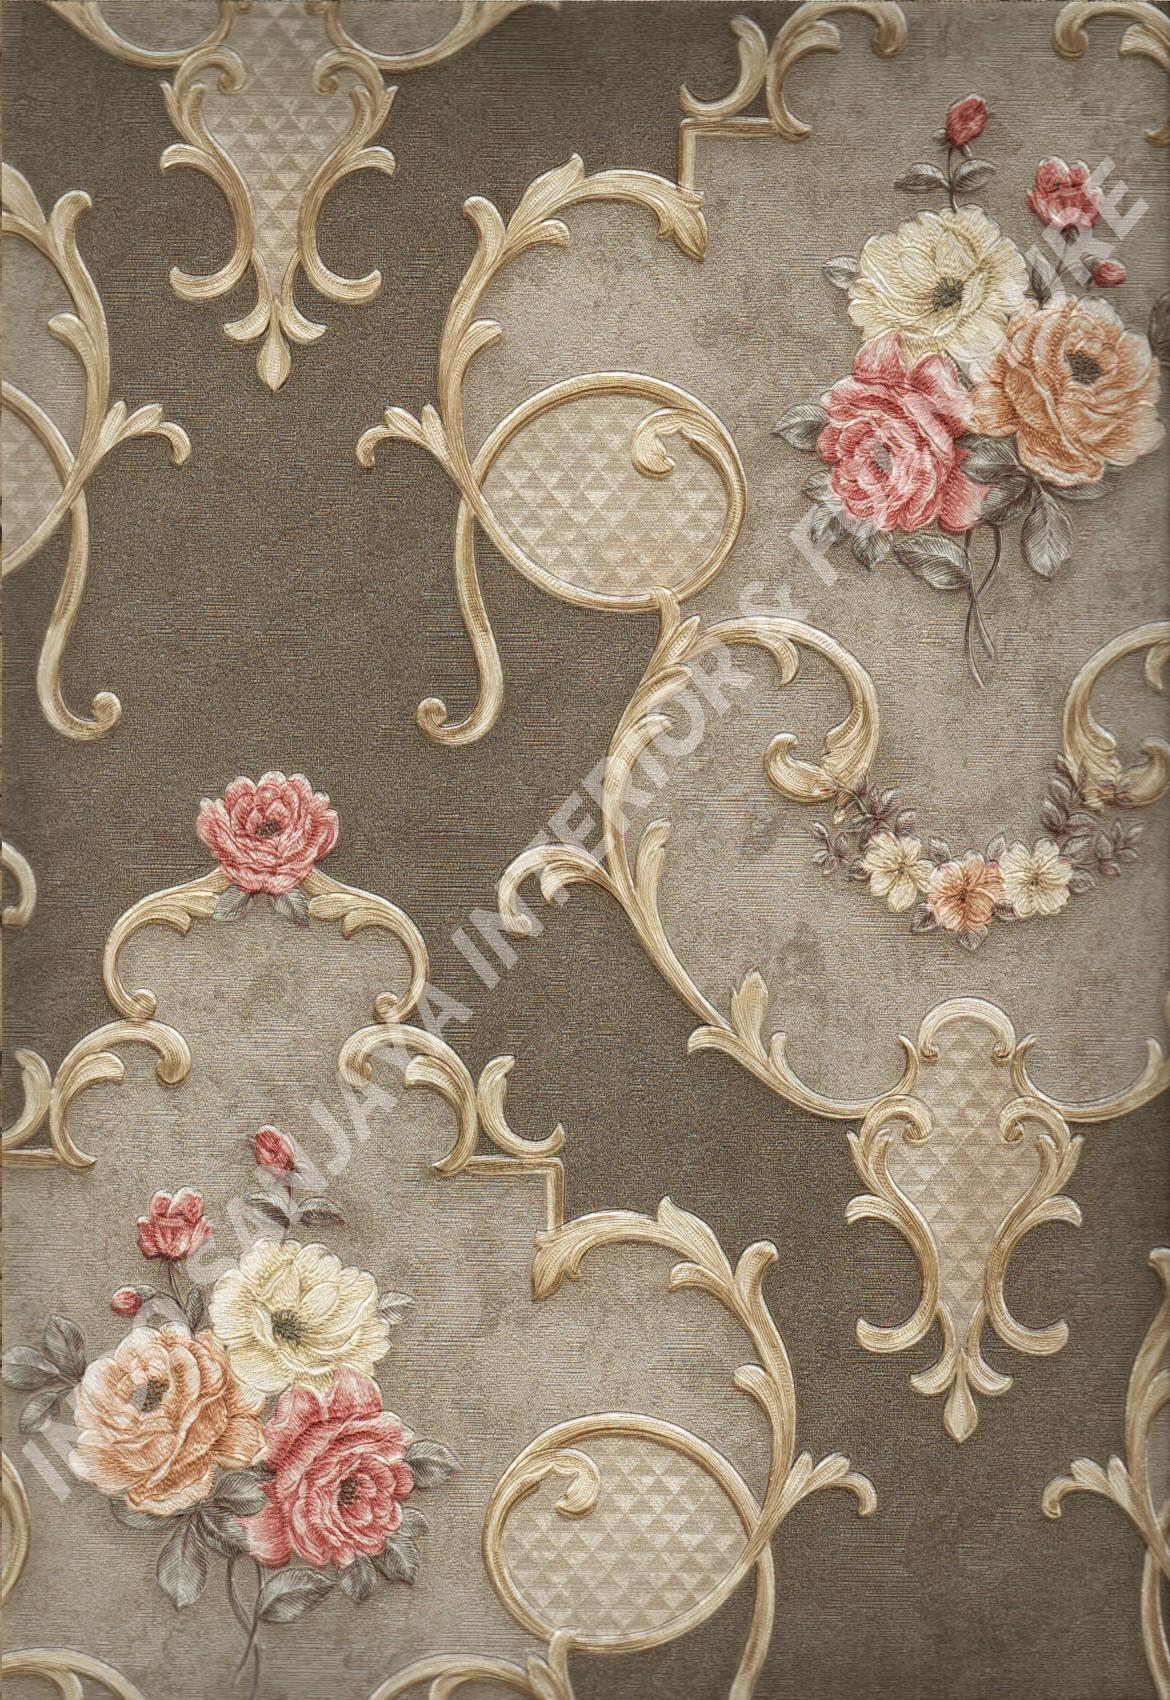 wallpaper   Wallpaper Bunga YG80105:YG80105 corak  warna